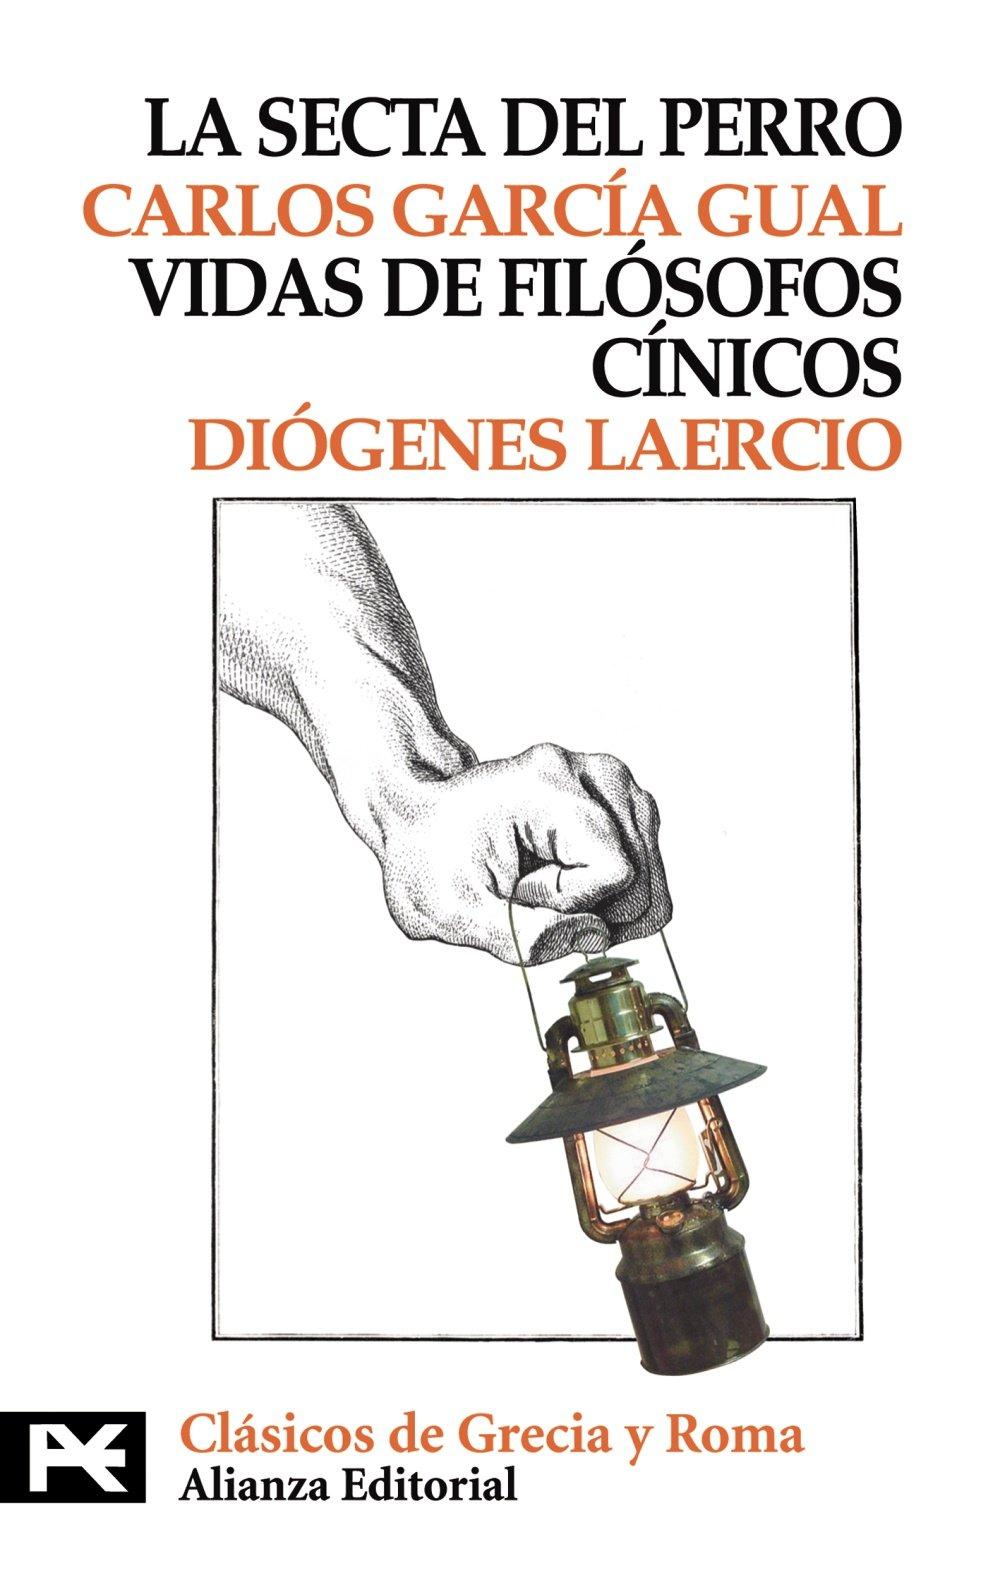 Download La Secta del Perro, Vidas de Filosofos Cinicos / The Dog's Sect, Lifes of Cynical Philosophers (El Libro De Bolsillo / The Pocket Book) (Spanish Edition) PDF